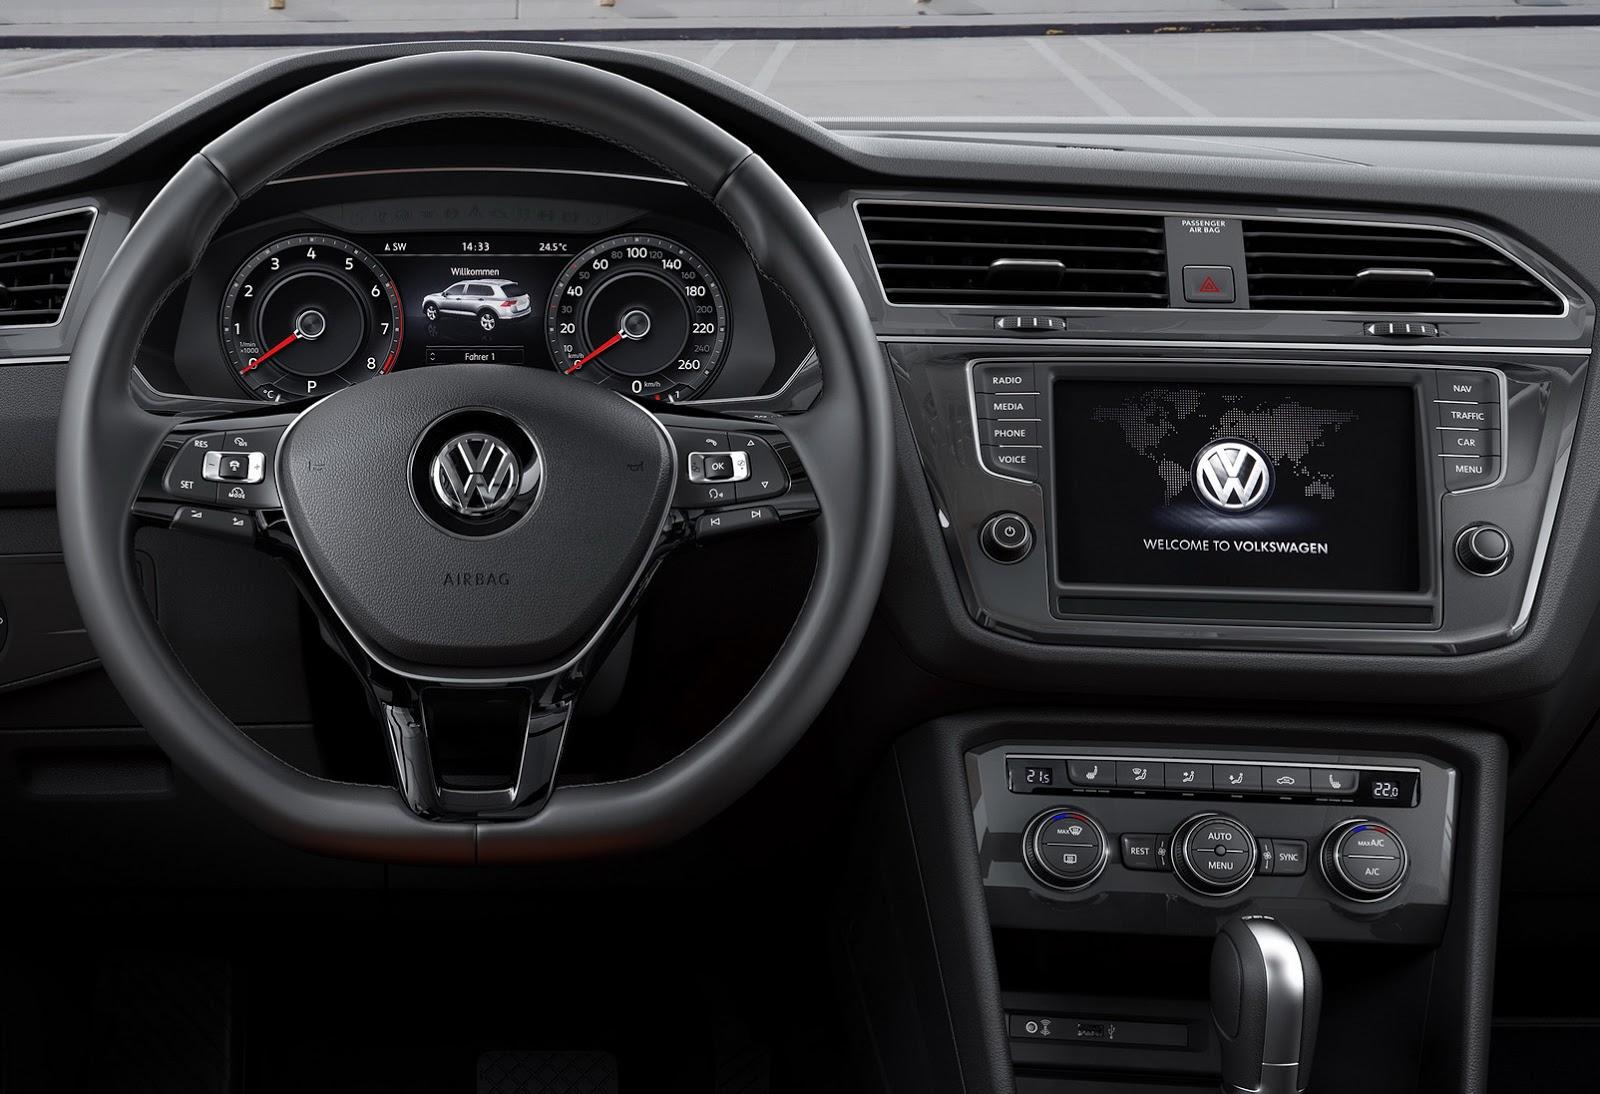 2016 Volkswagen Tiguan Shows Up at the Frankfurt Motor Show – Photo Gallery - autoevolution